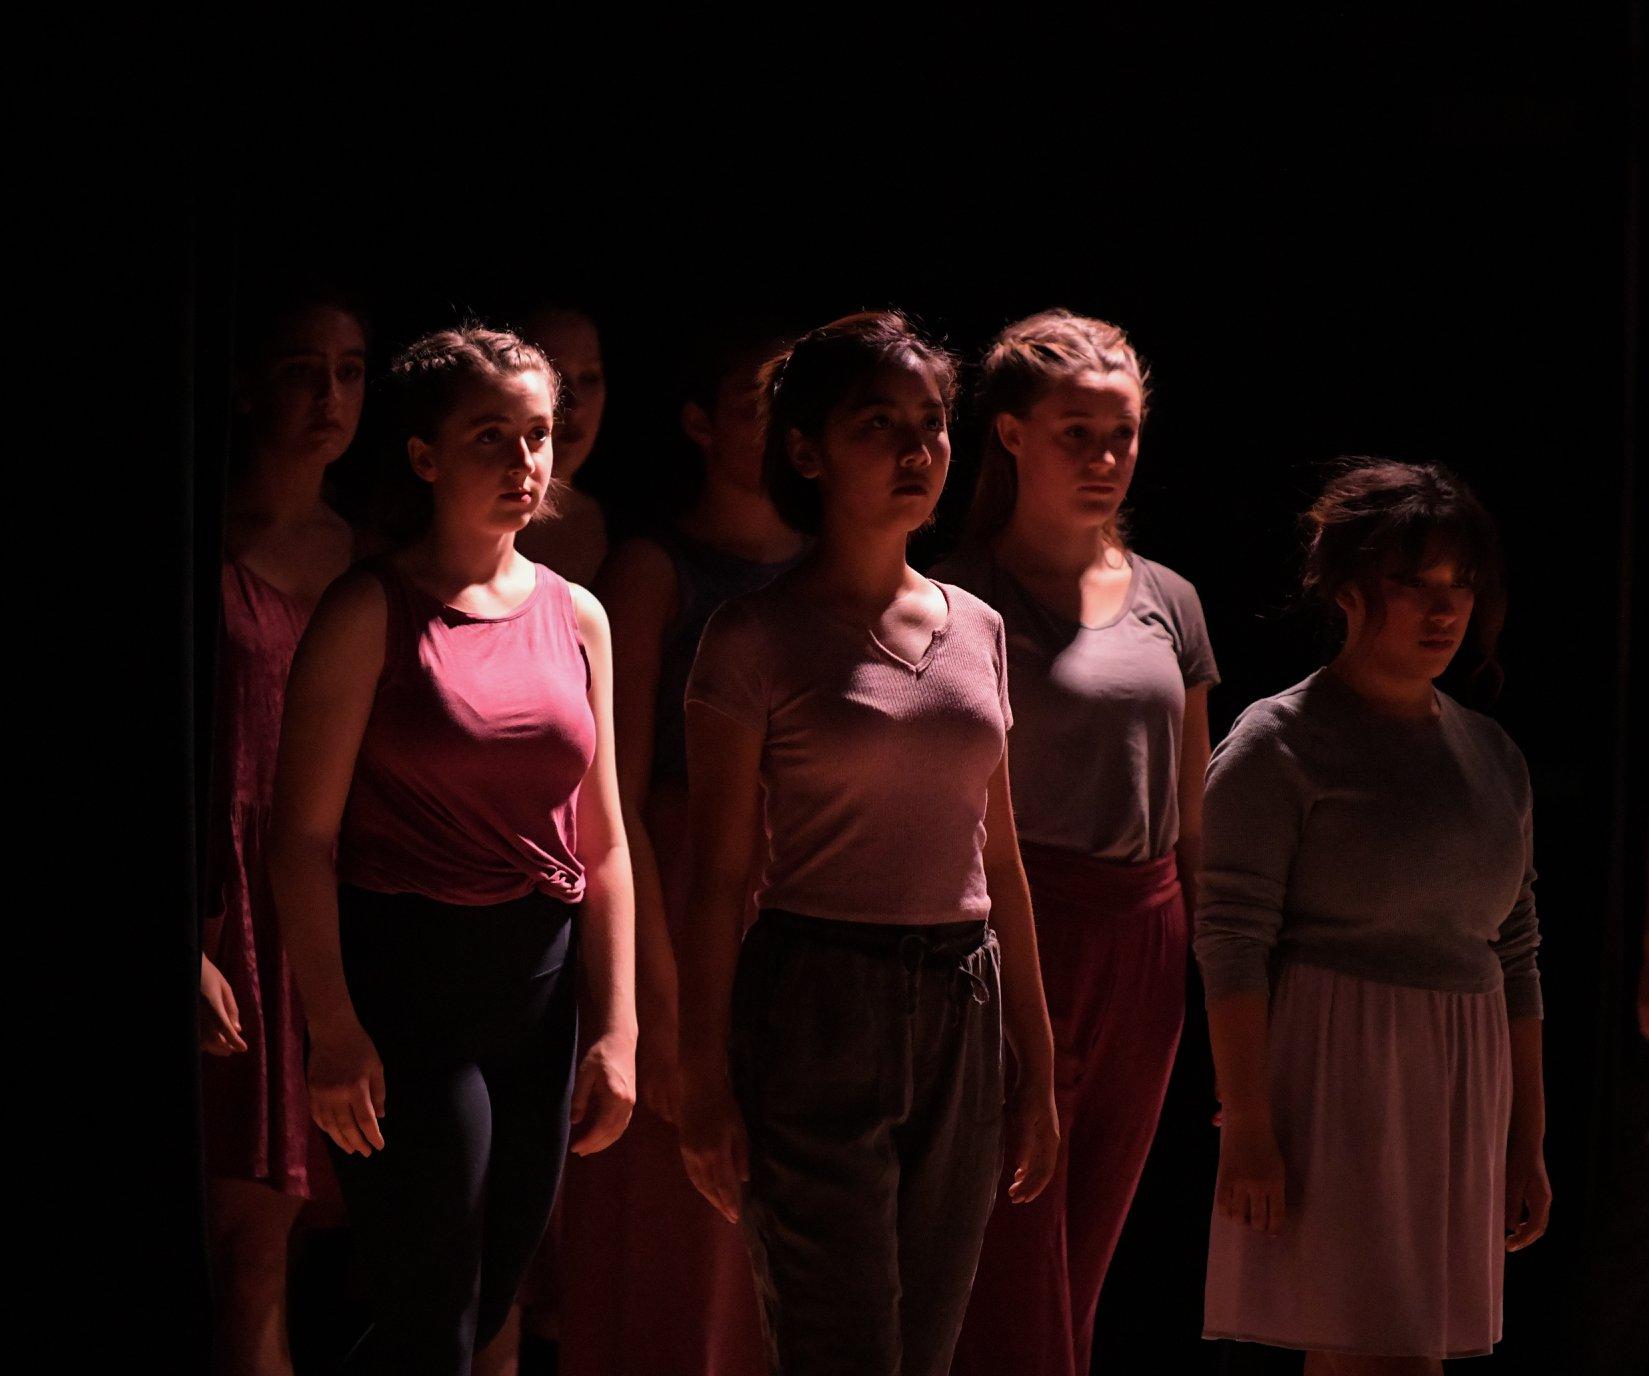 Seven girls standing still, the lighting shinning above their heads